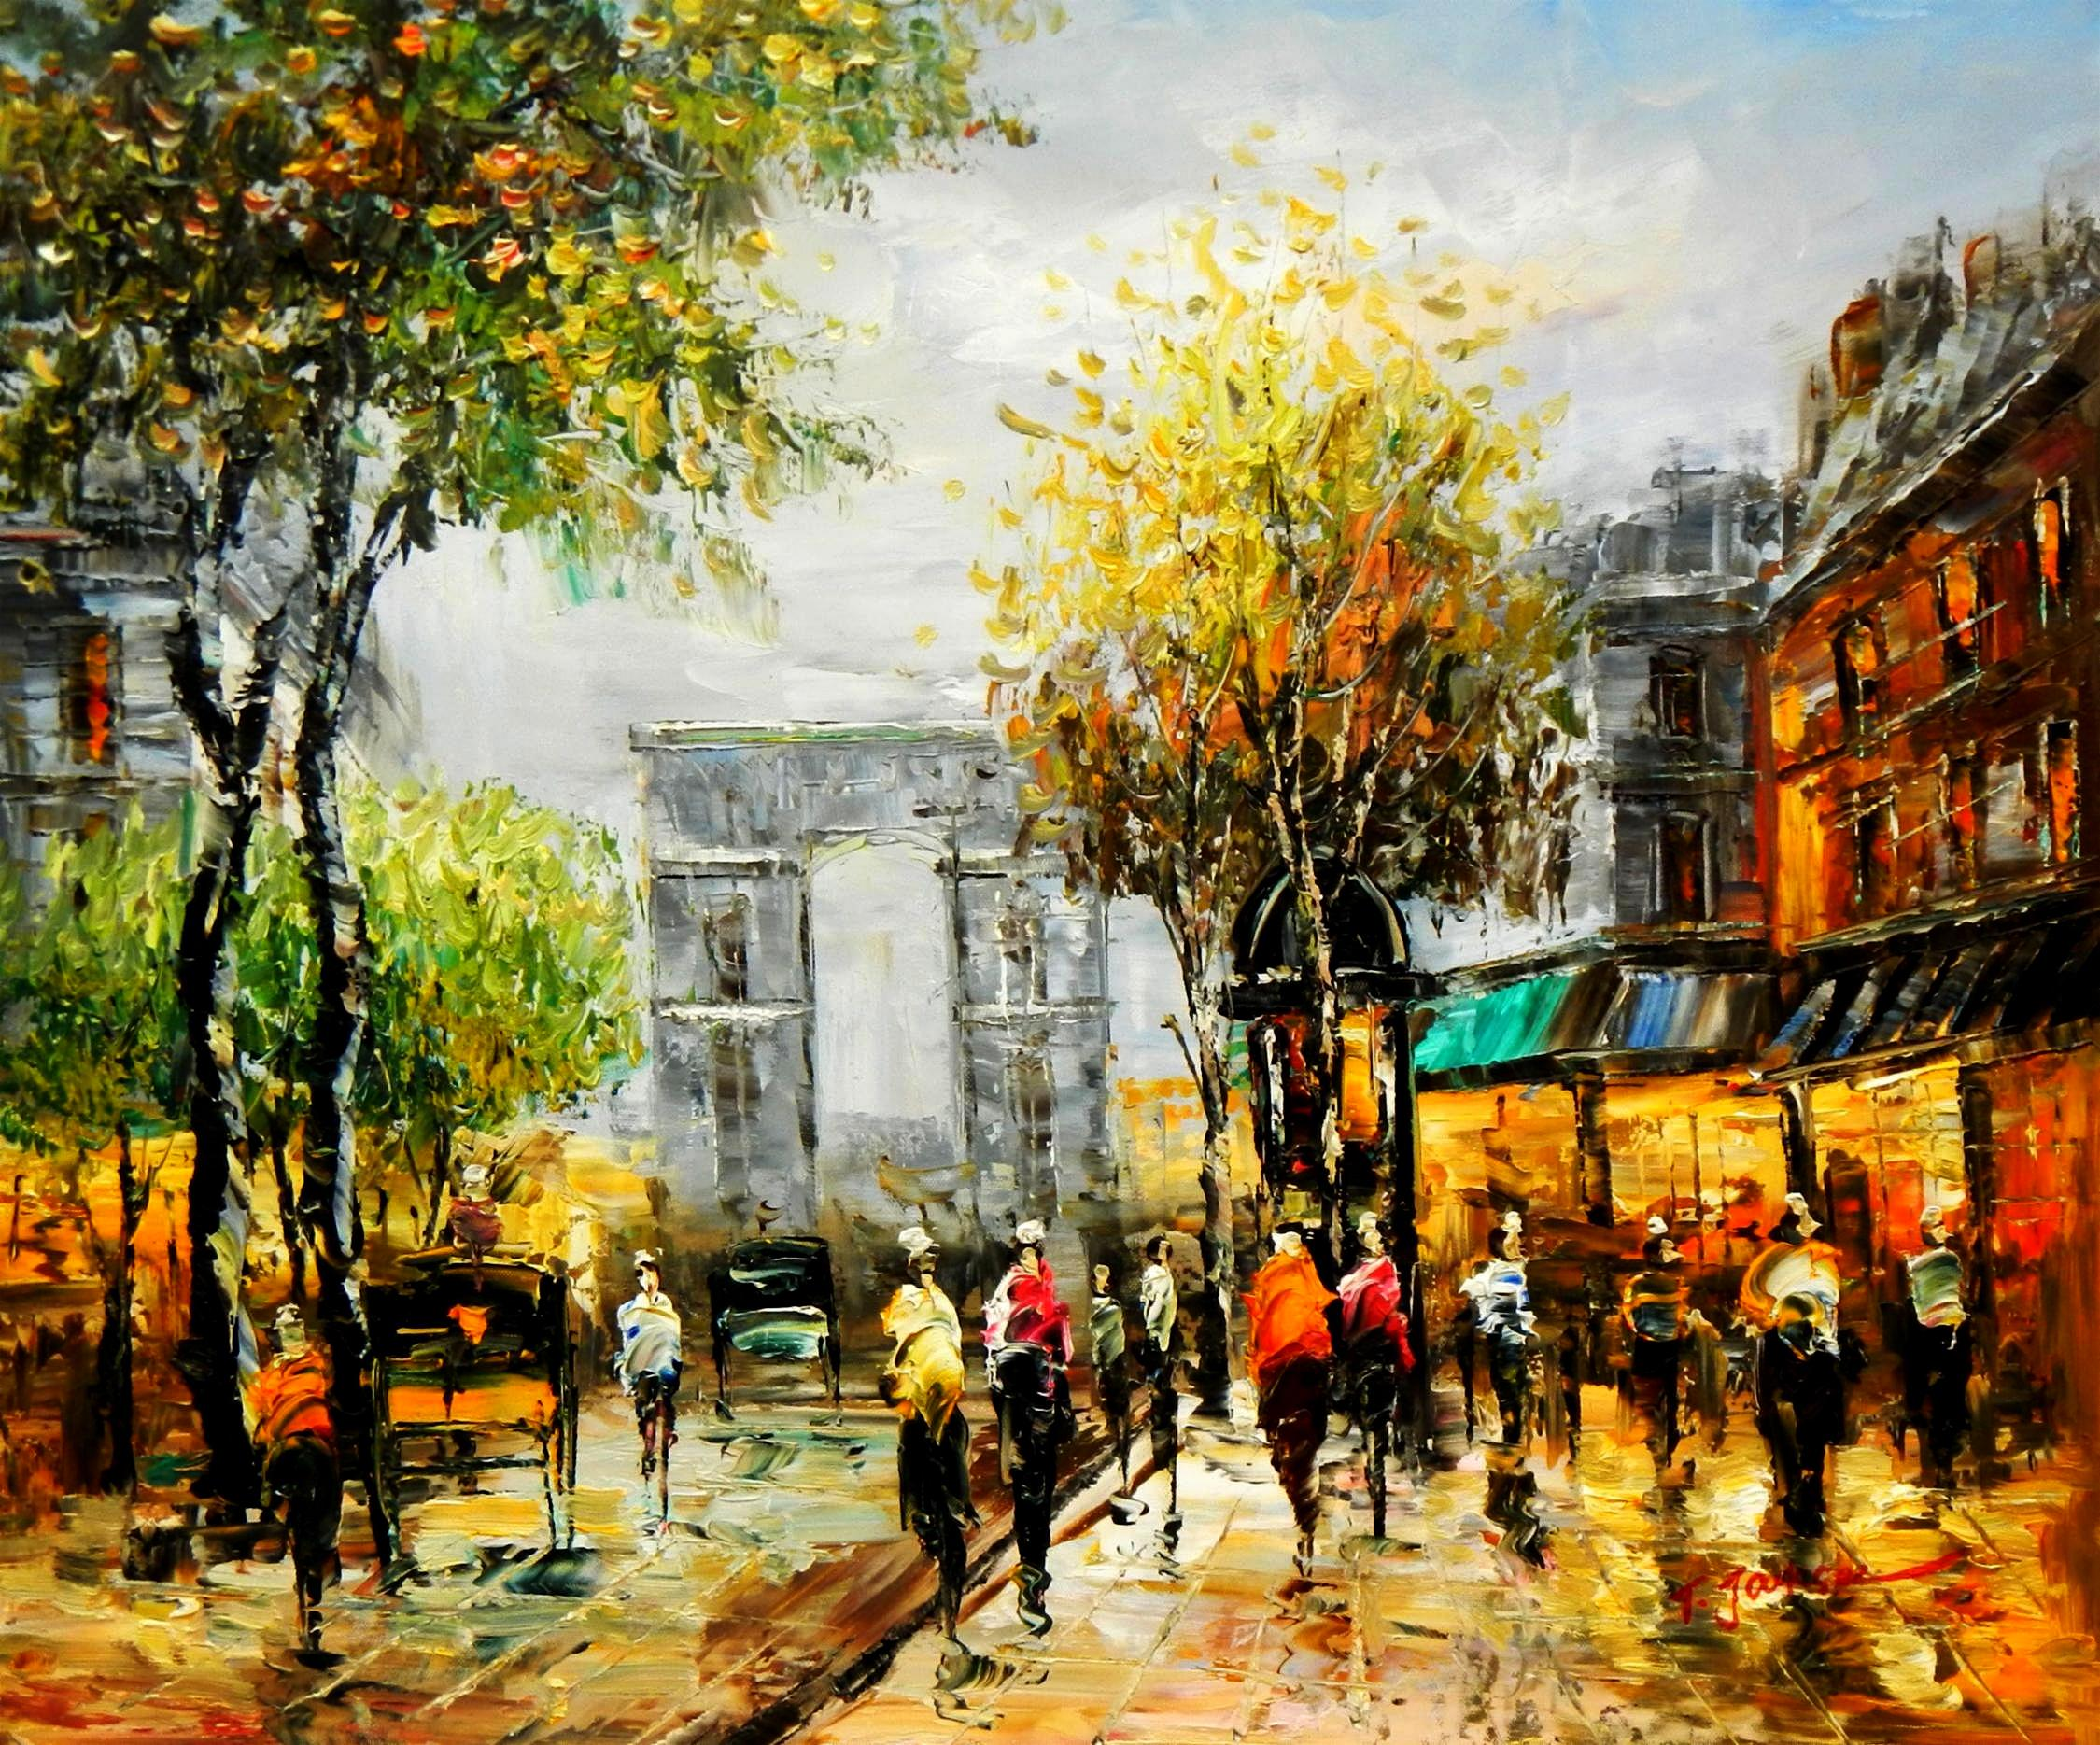 Modern Art - Sommer am Arc de Triomphe Paris c94569 50x60cm Ölbild handgemalt